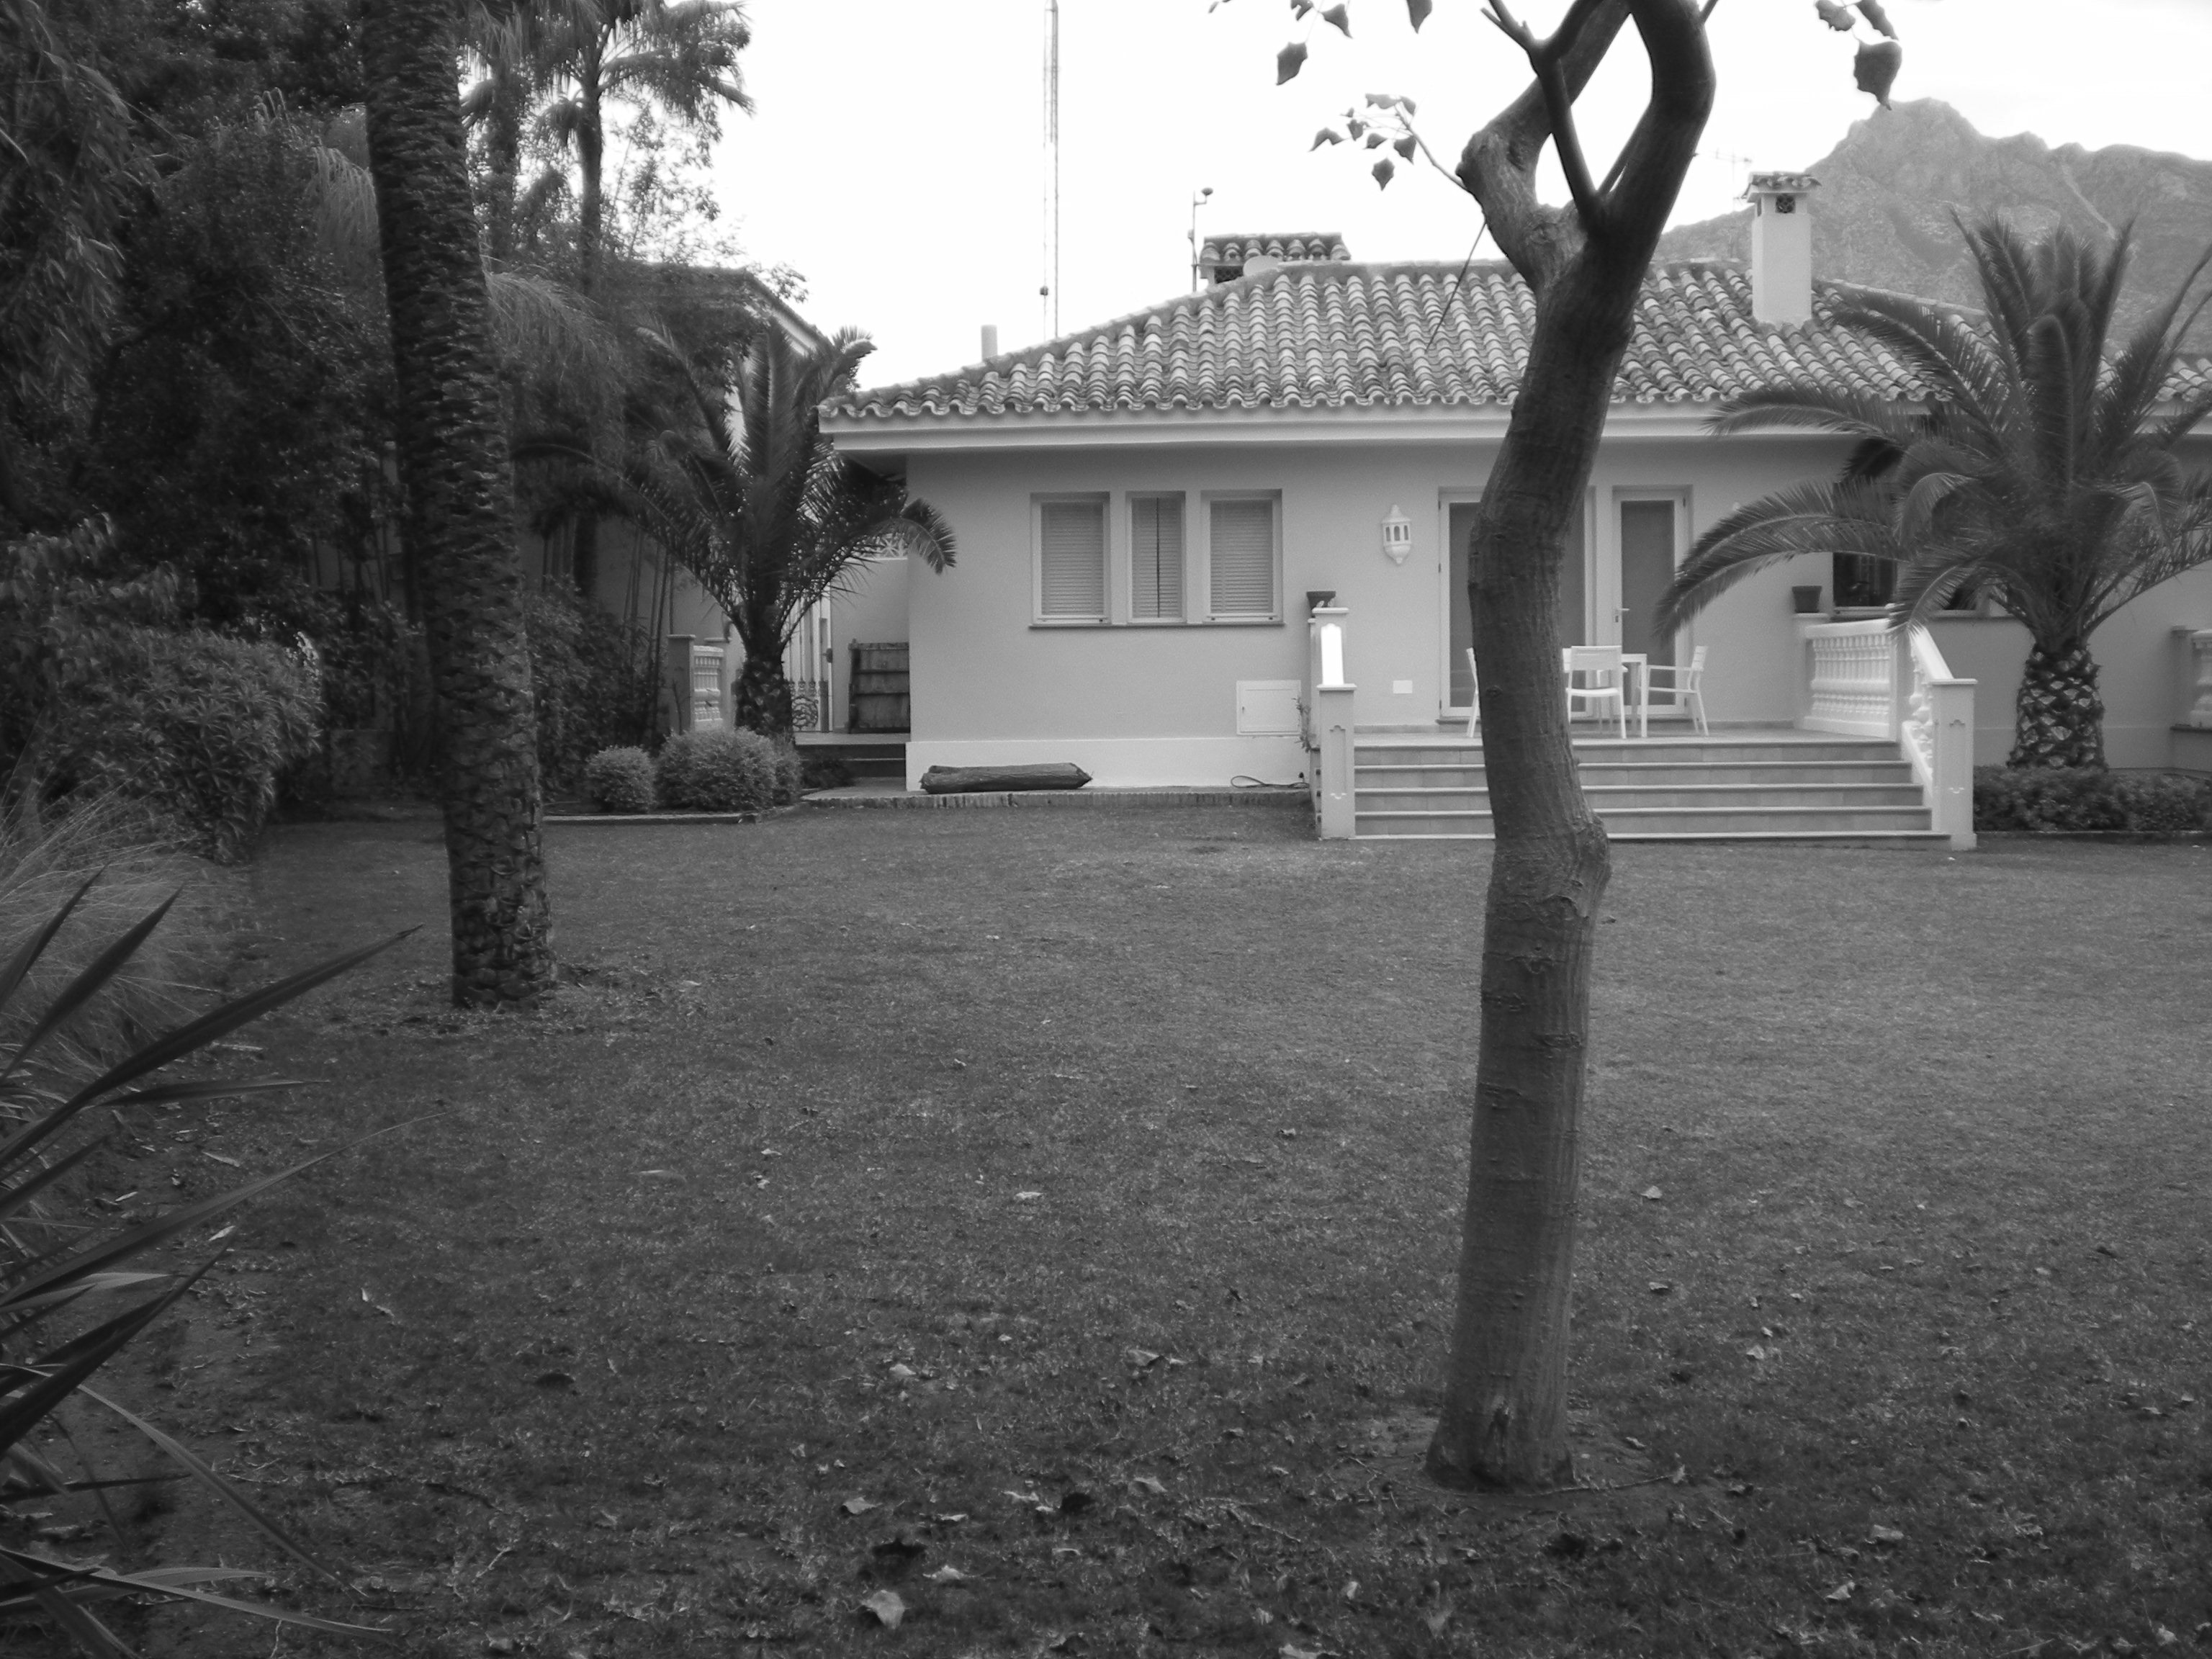 http://tobal.net/wp-content/uploads/2009/08/Los-Verdiales-Anterior-4.jpg